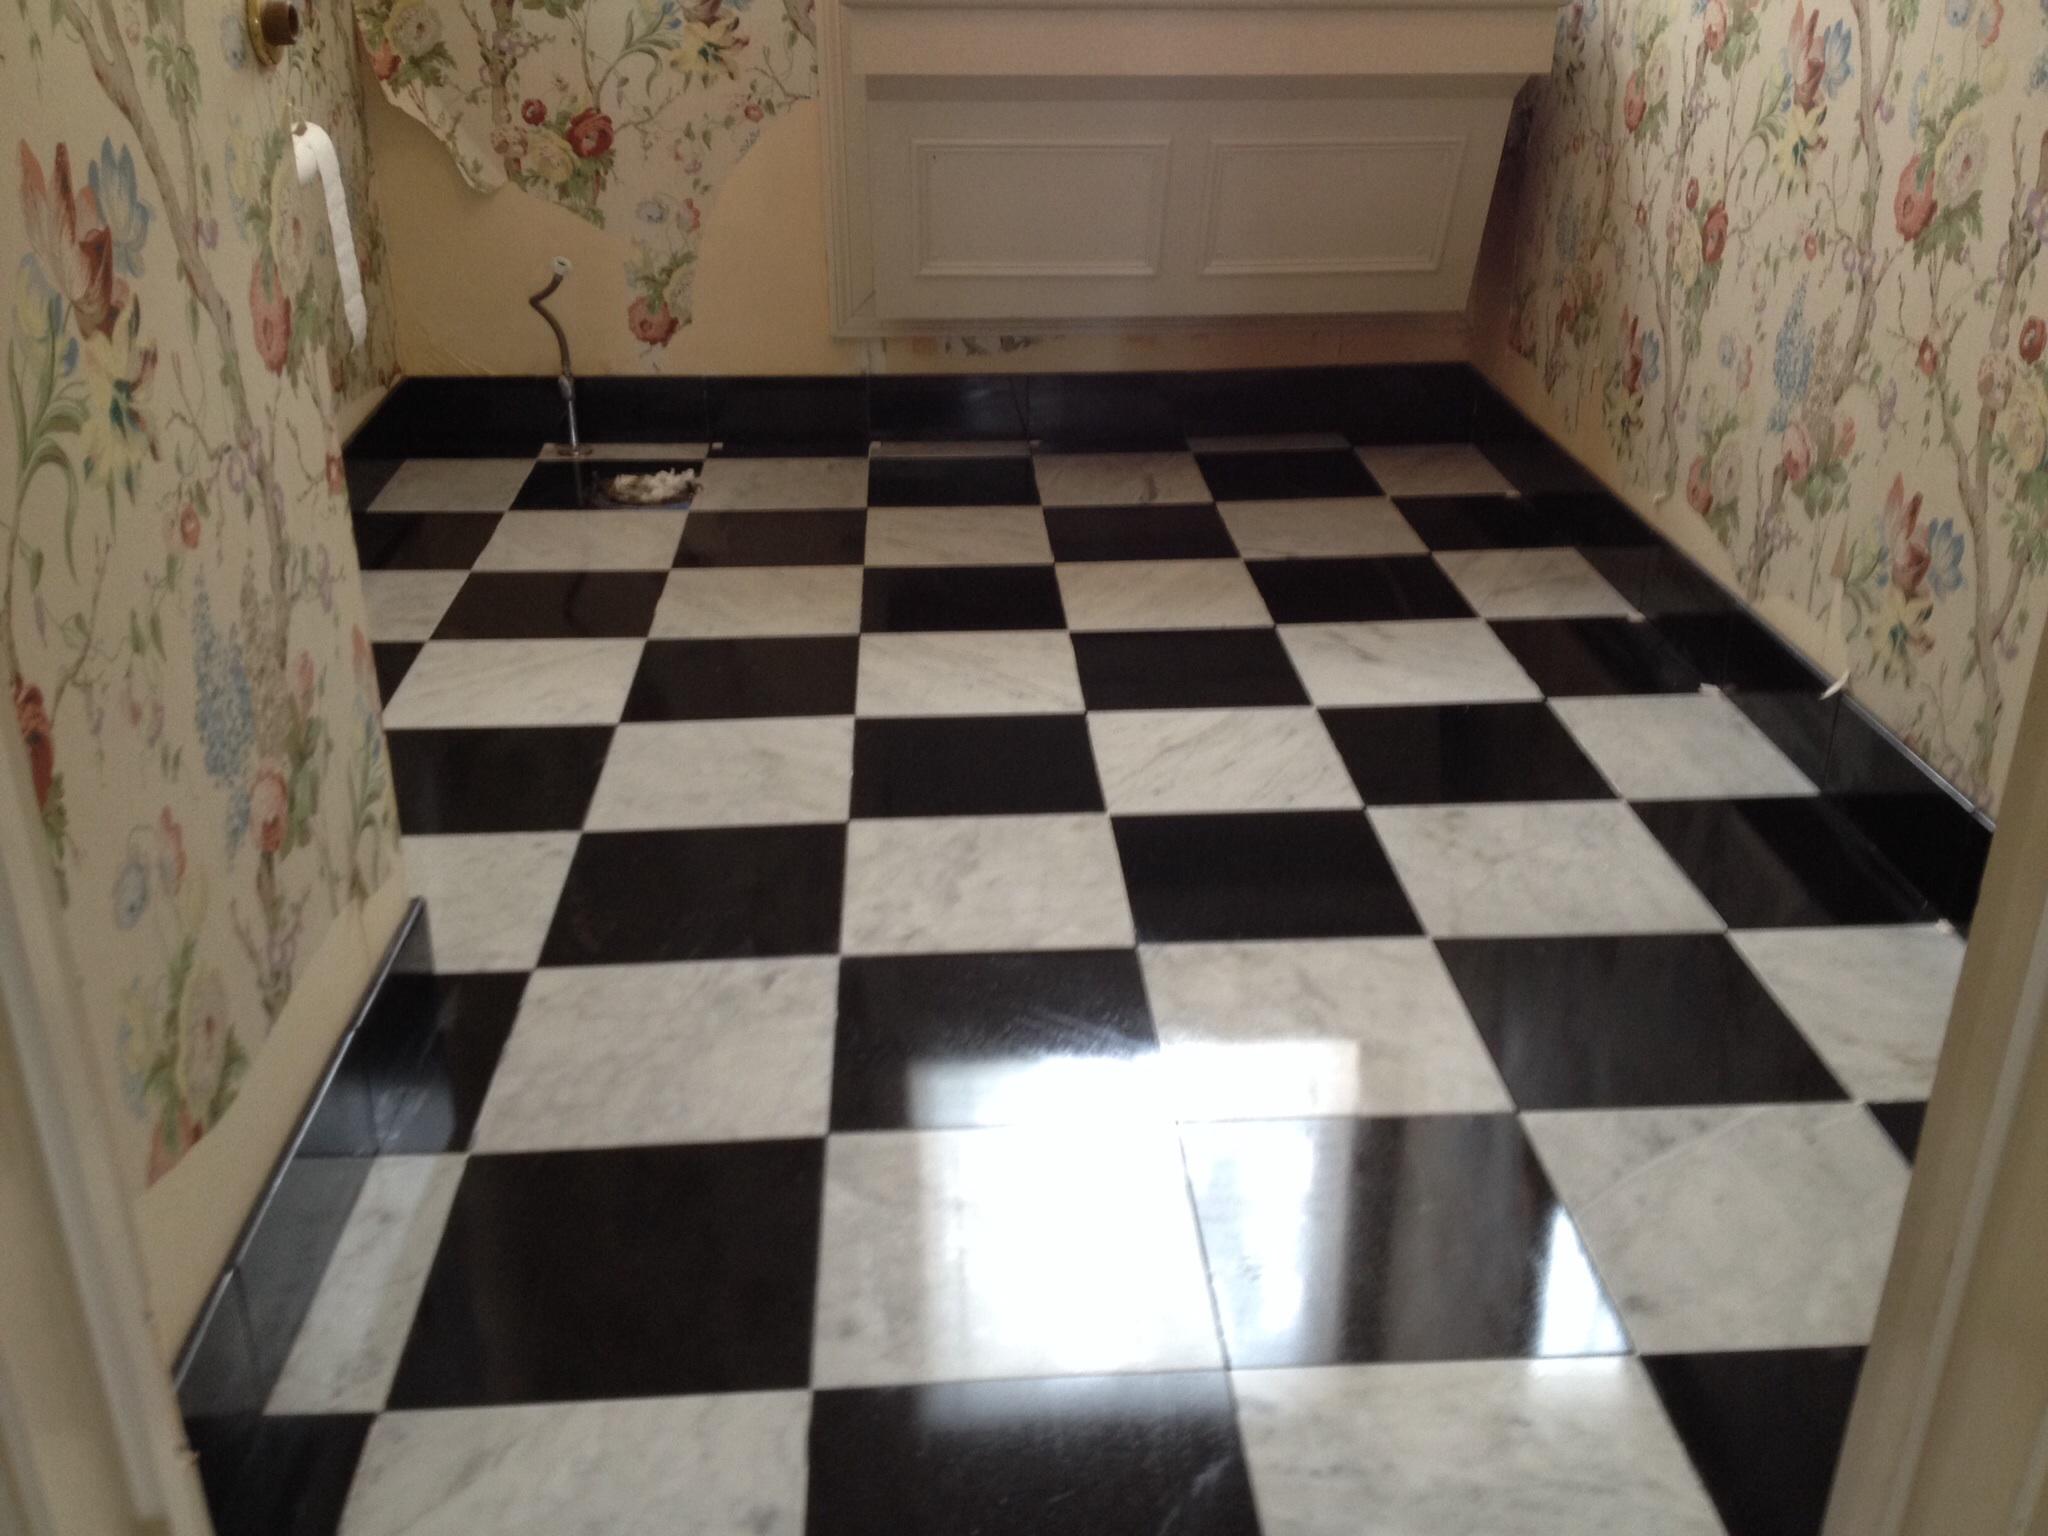 Bel Air Tile Amp Marble Abingdon Maryland Proview